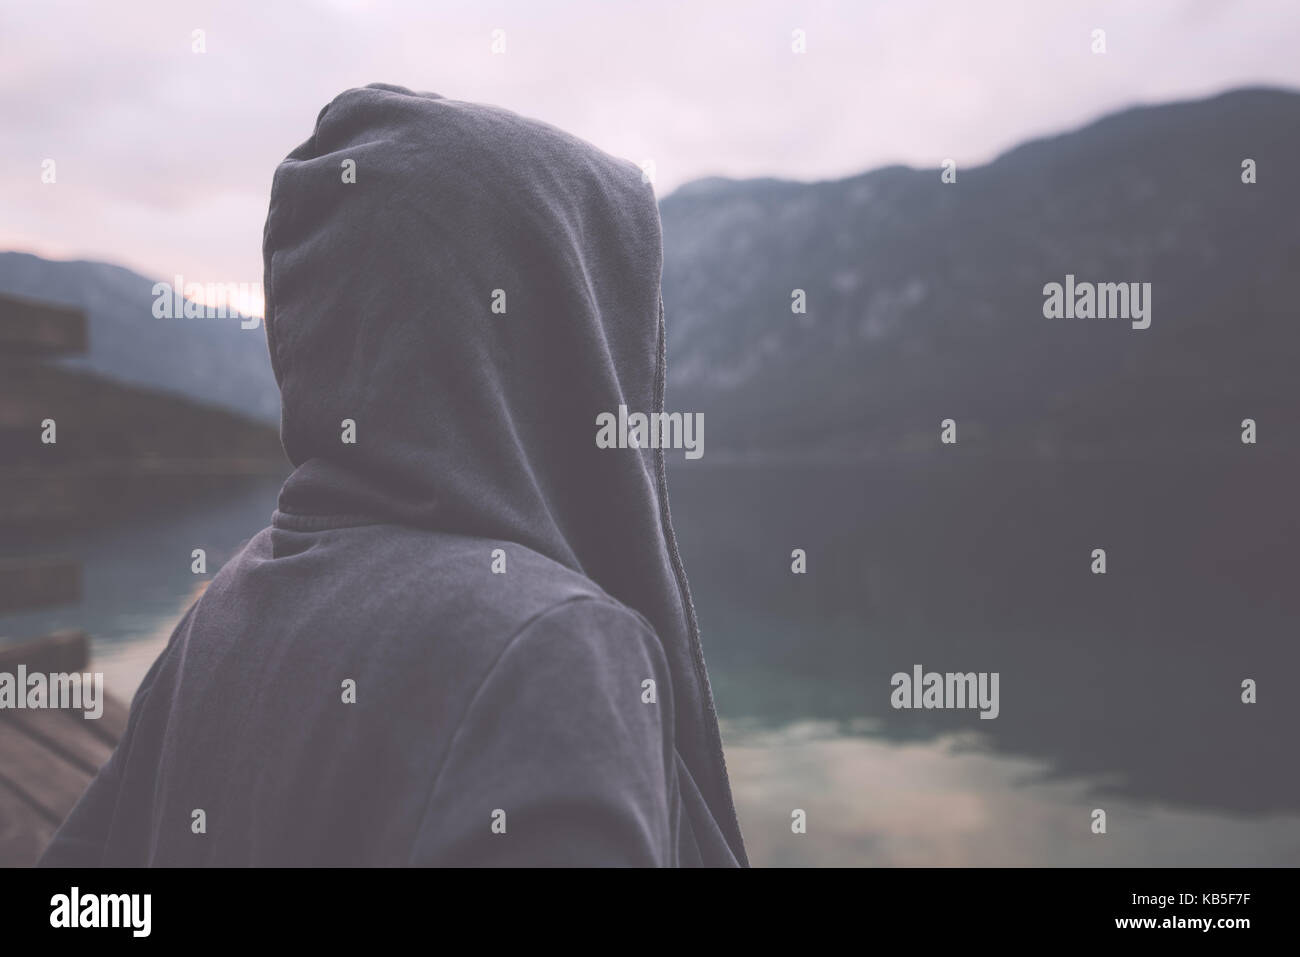 Sombrío retrato nostálgico de triste soledad melancólica hembra adulta con chaqueta con capucha parado Imagen De Stock